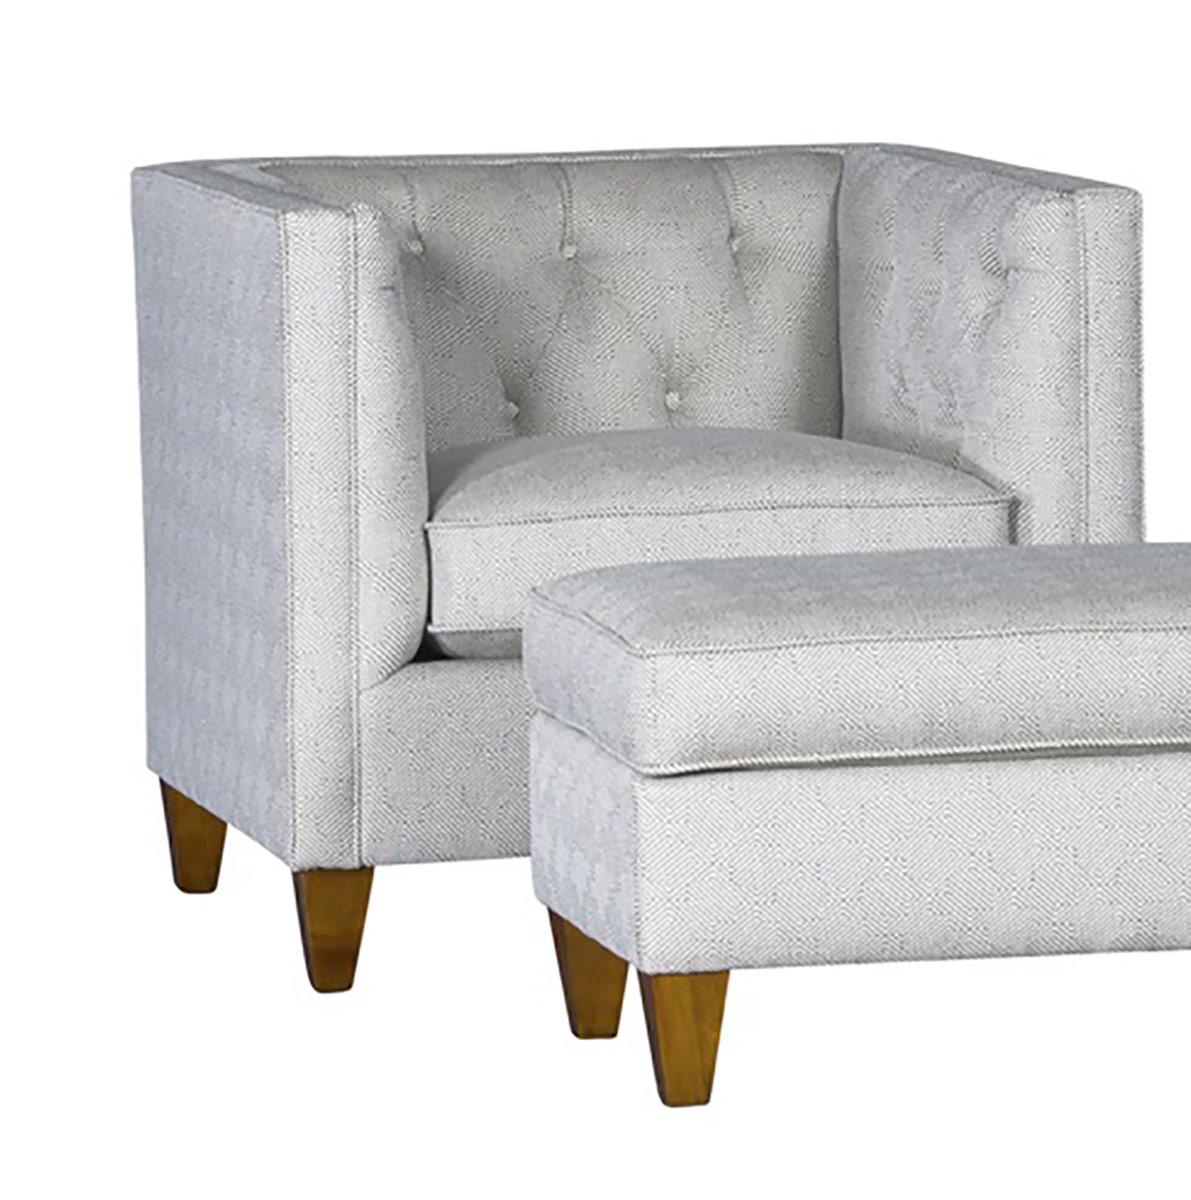 Chelsea Home Sudbury Chair - White